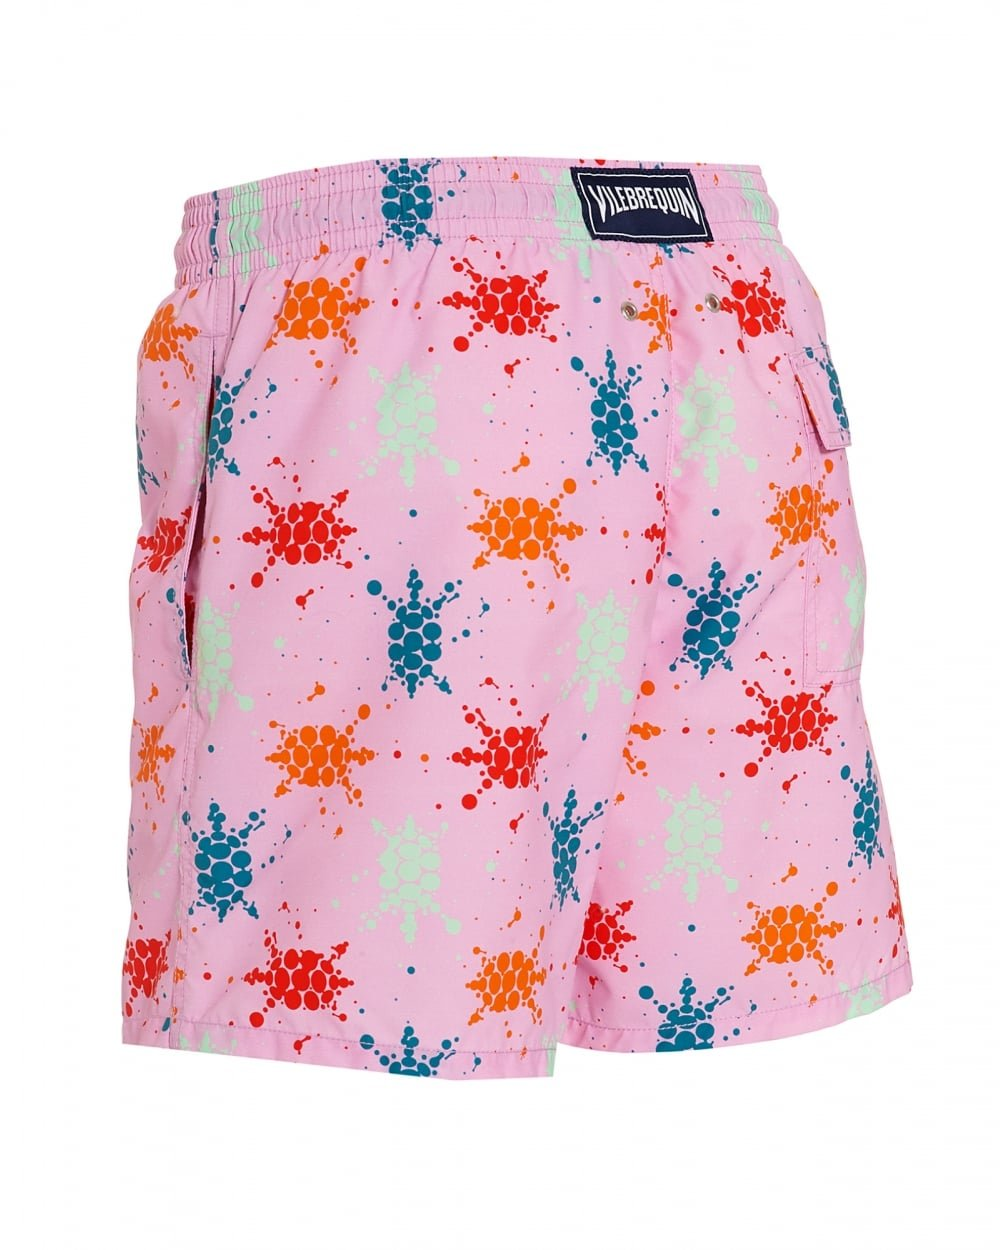 Vilebrequin - Japan Turtles Moorea Swimwear - Men - XXL - Rose Quartz by Vilebrequin (Image #2)